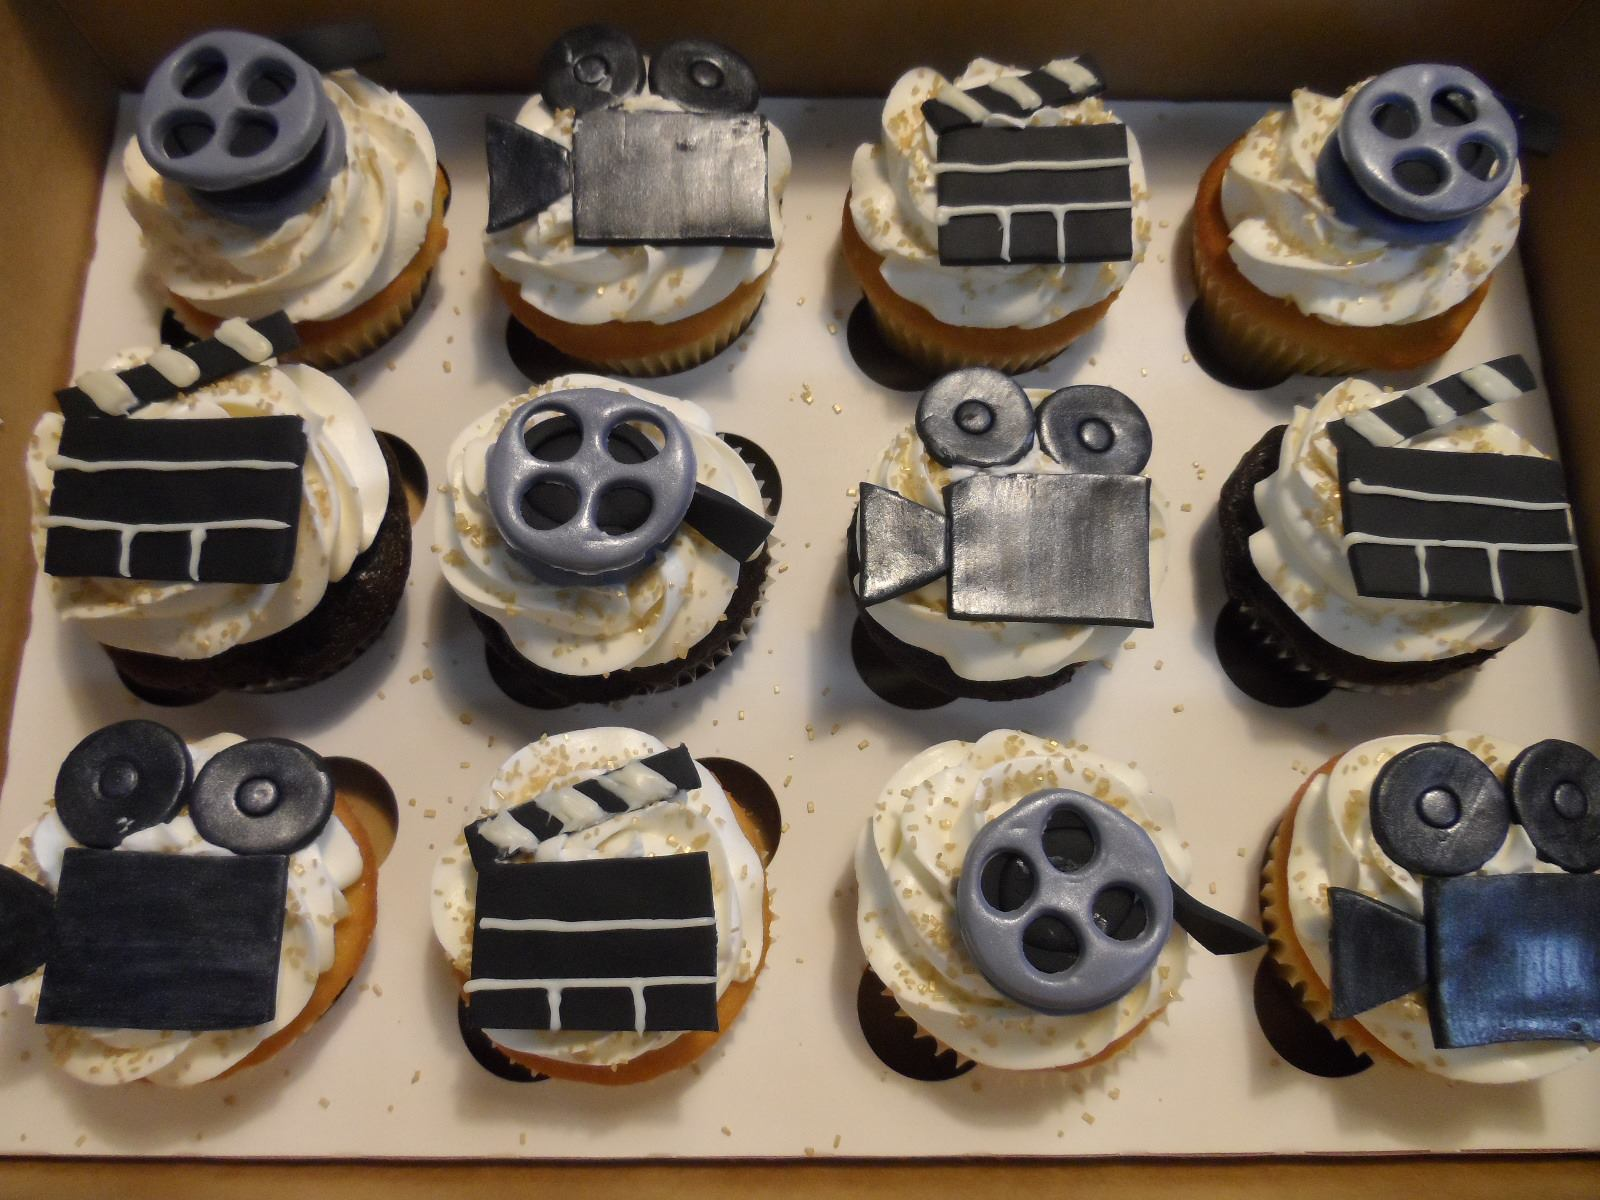 Classy Cakes Cupcakery cupcakes